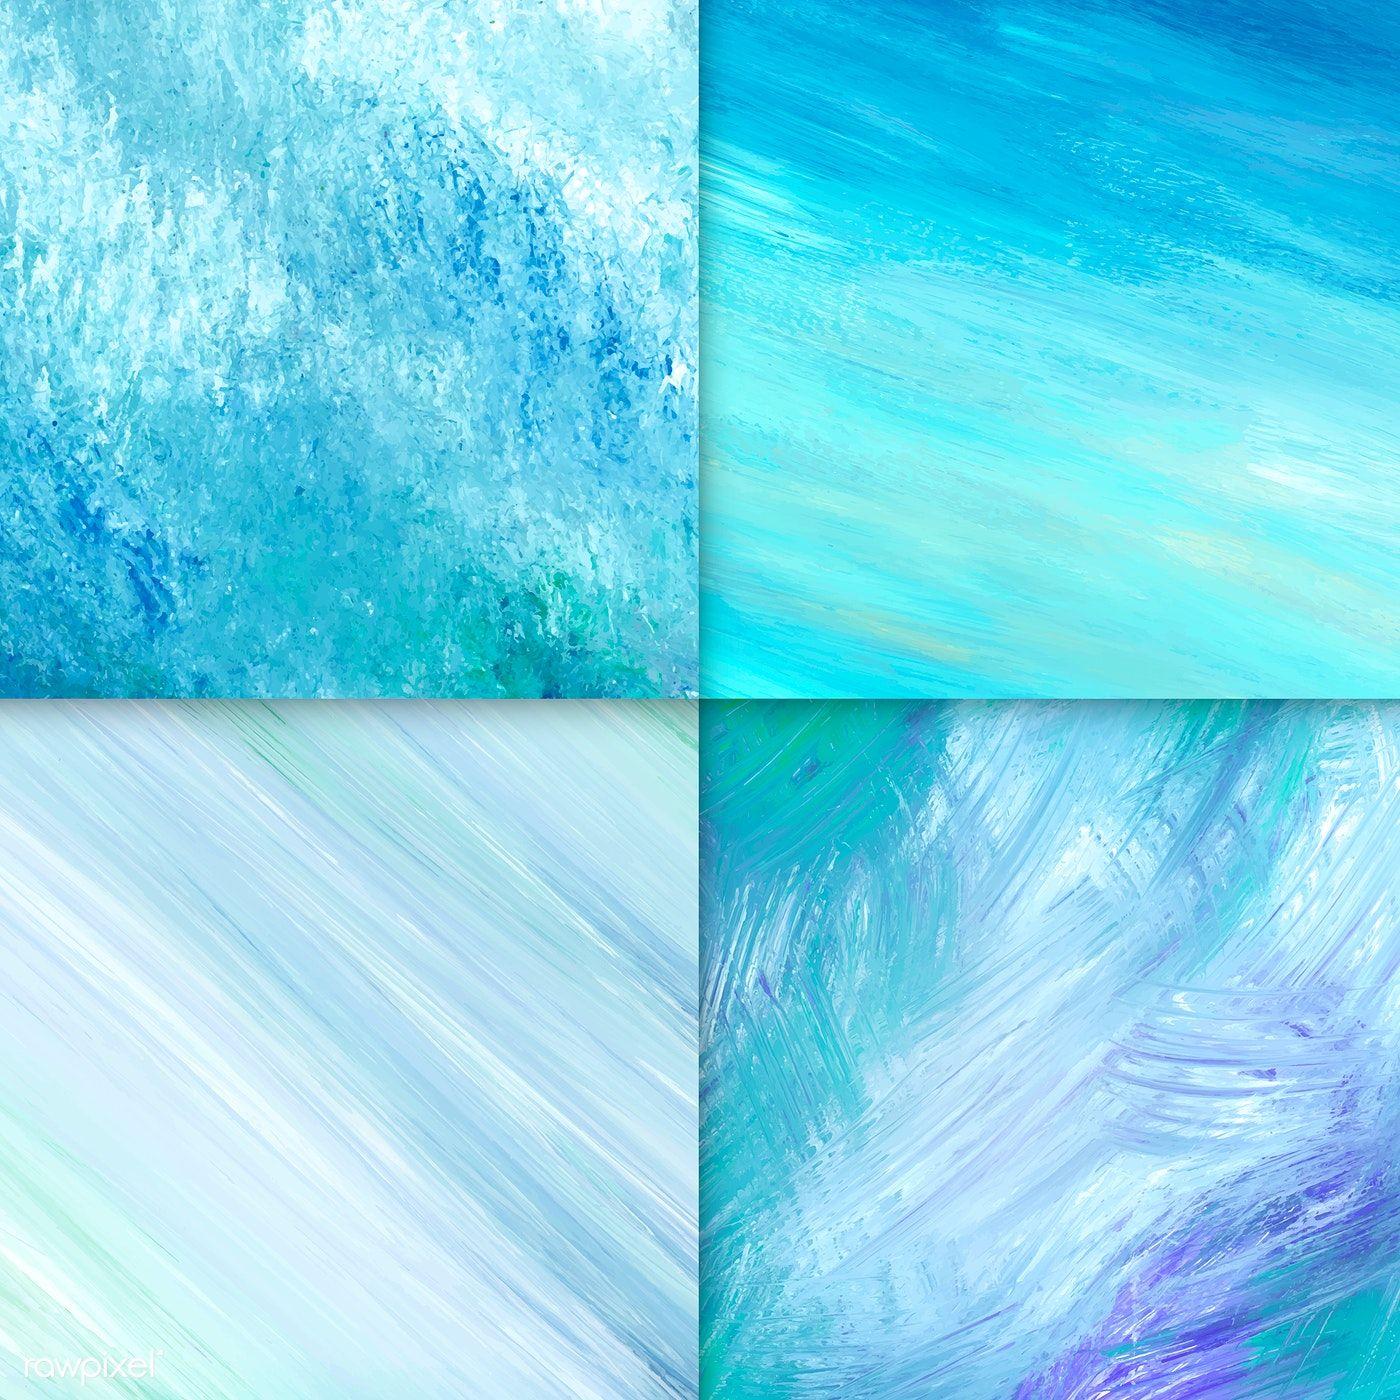 Teal acrylic brush stroke textured background vectors set